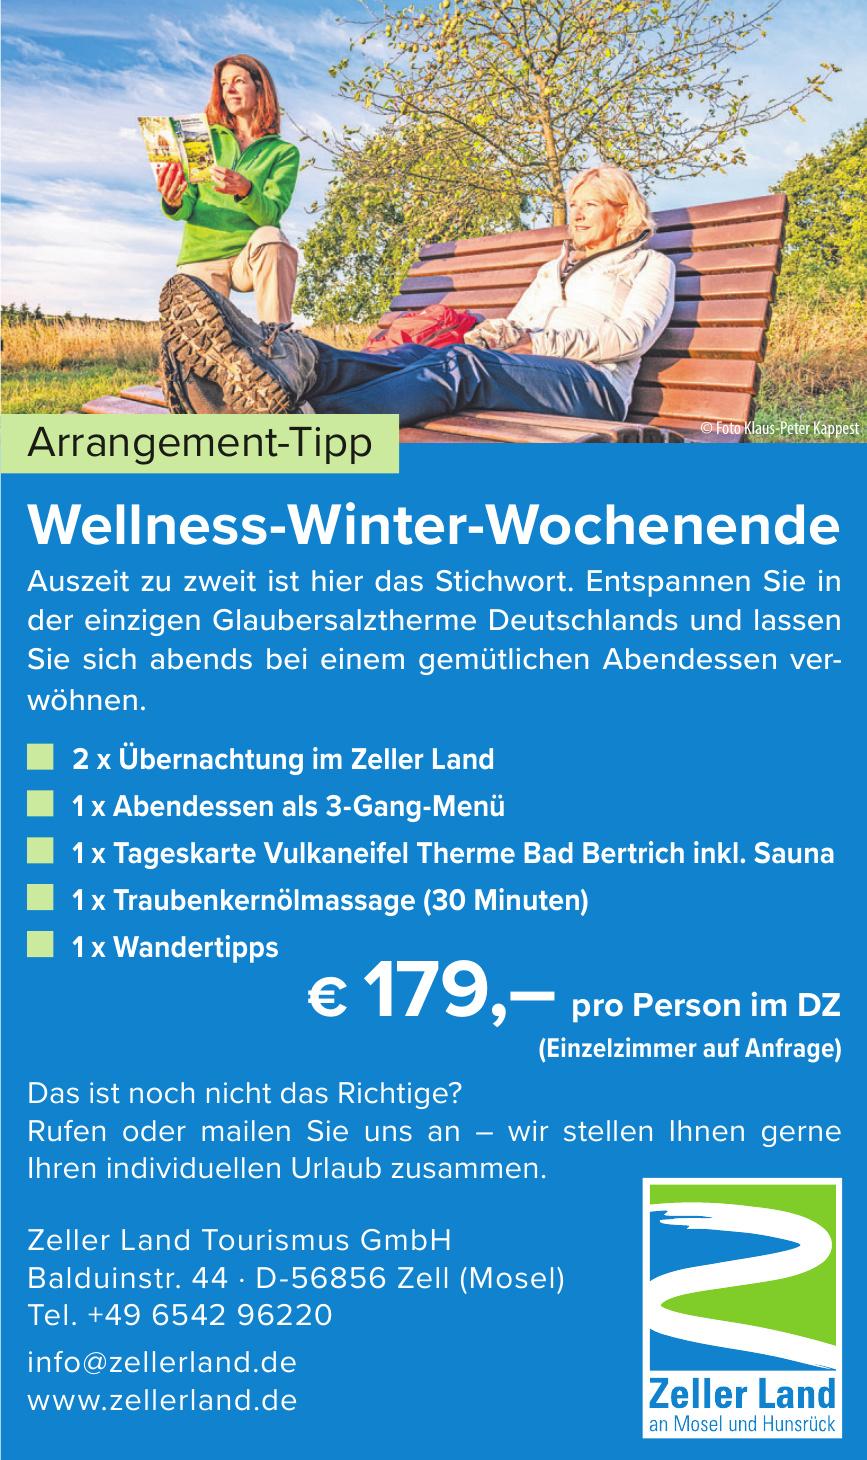 Zeller Land Tourismus GmbH